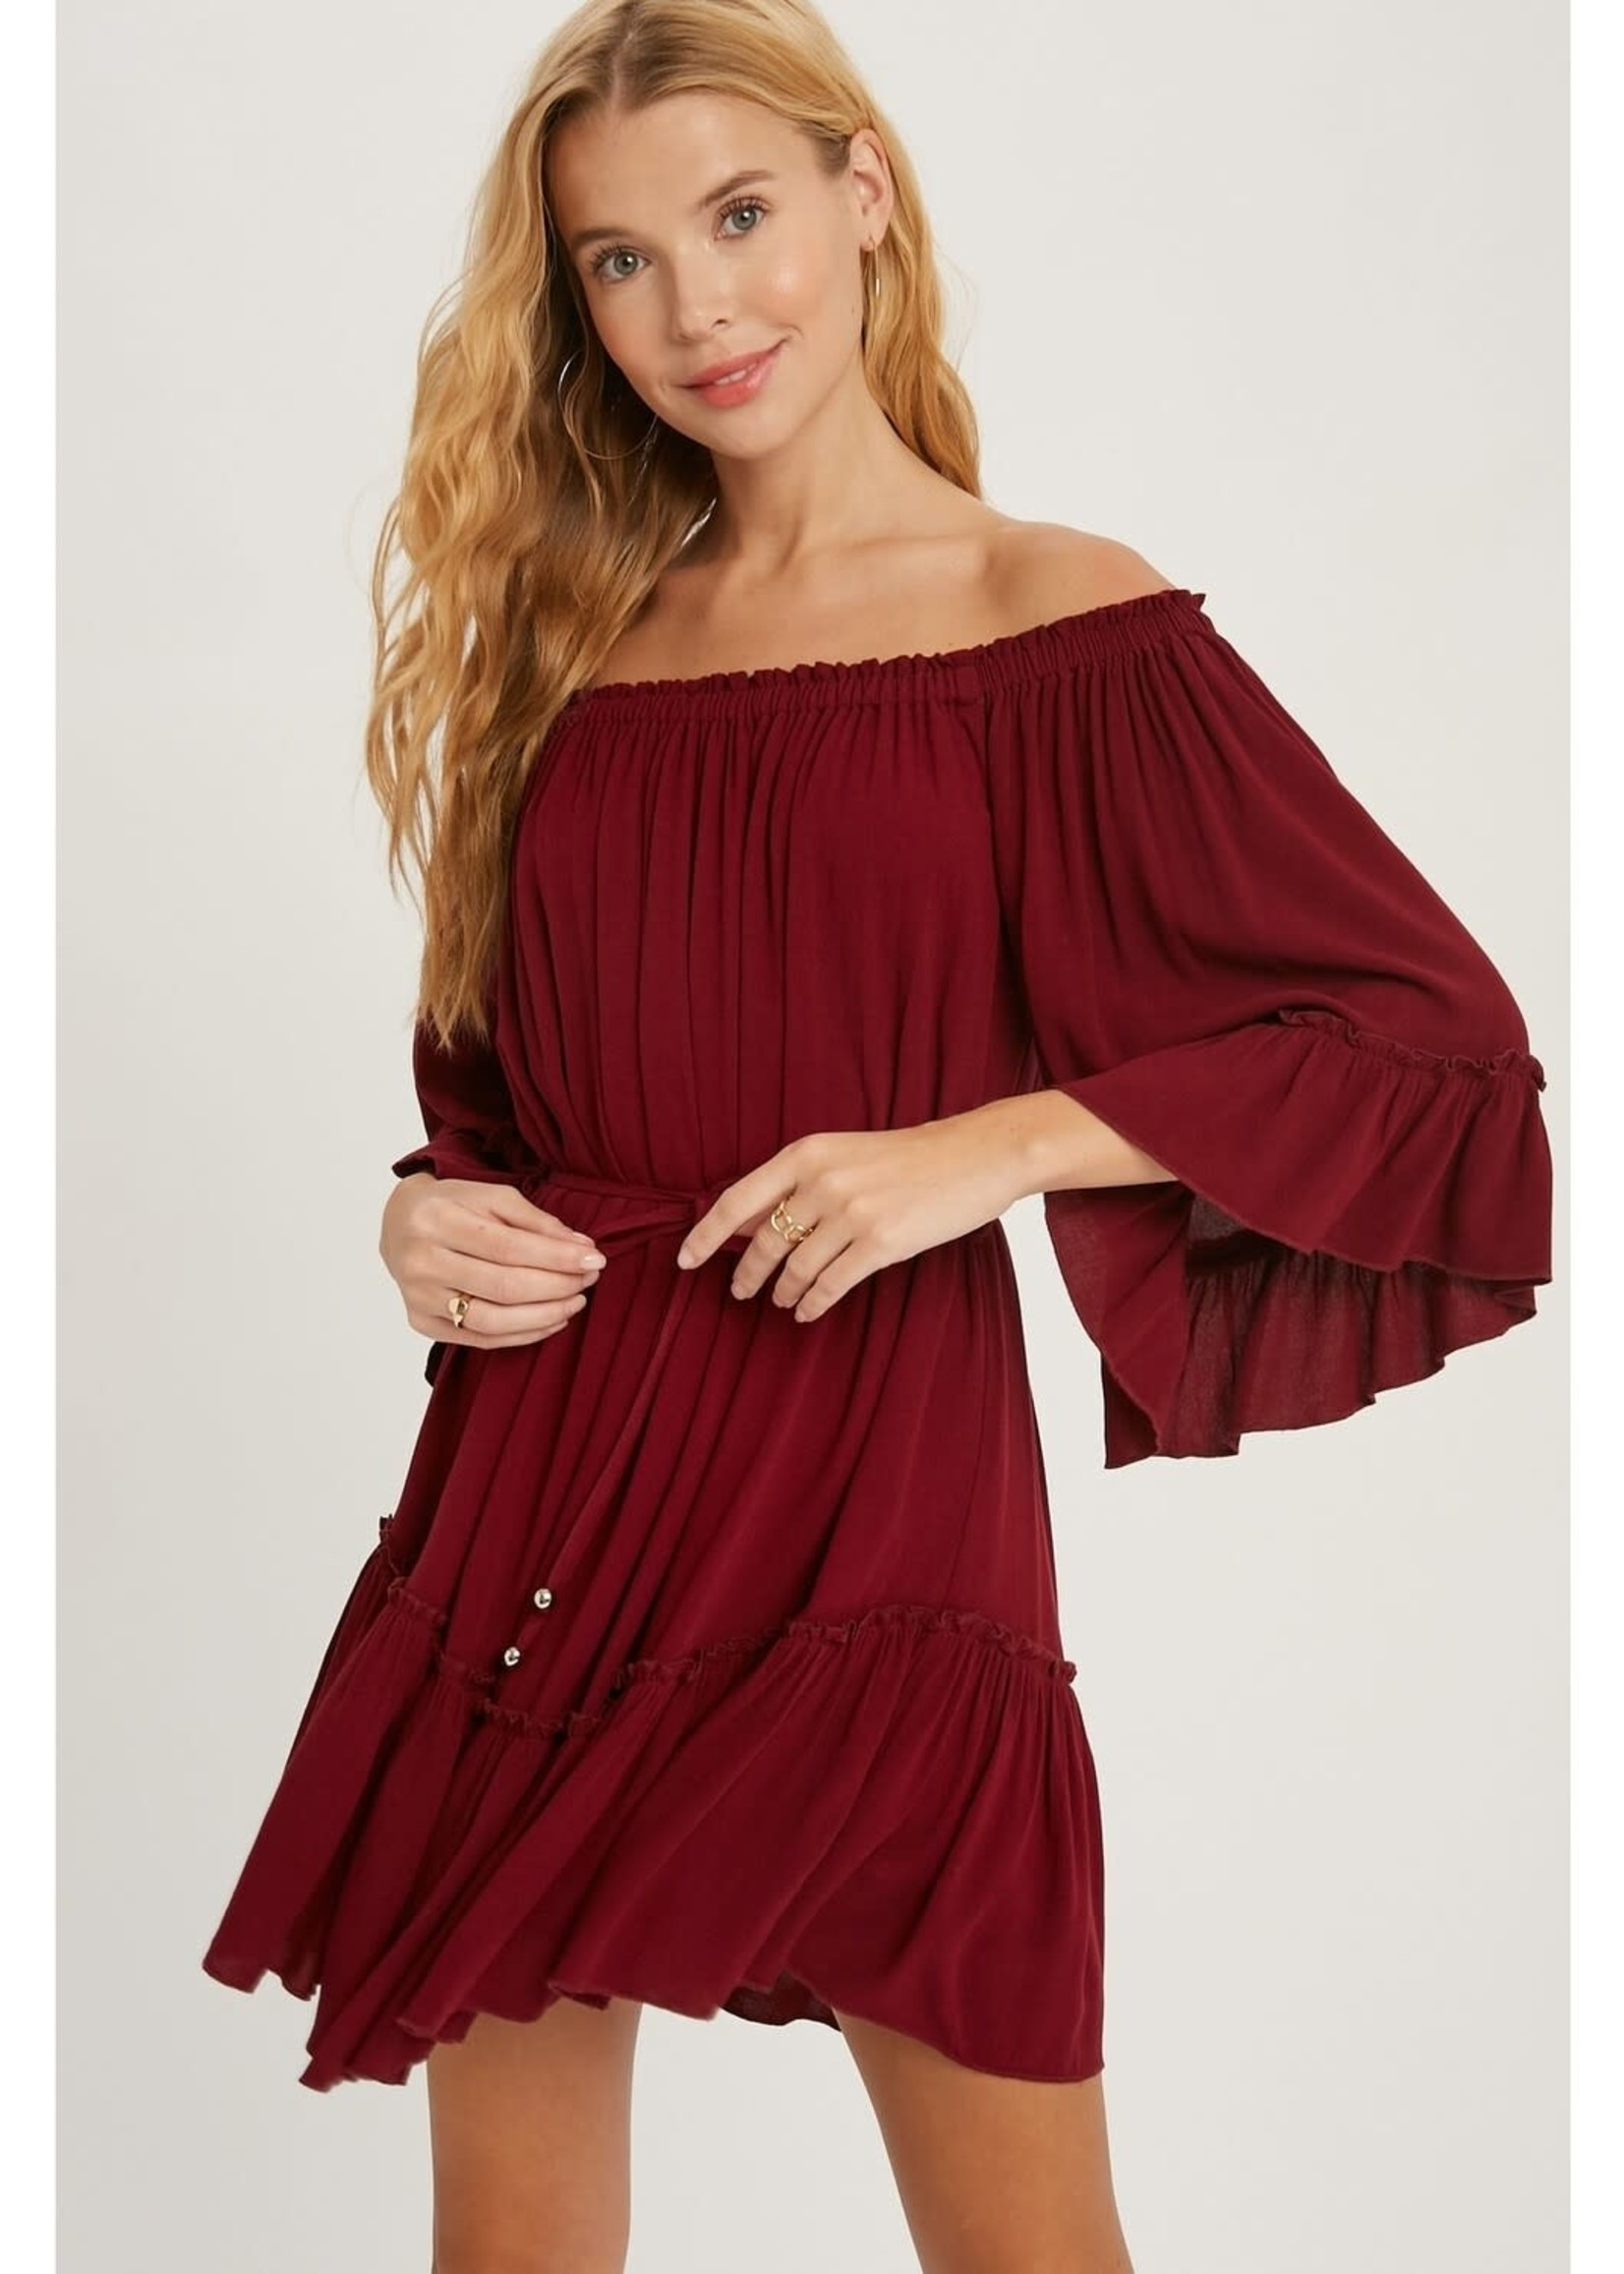 Ruffled Solid Boho Dress - Burgundy